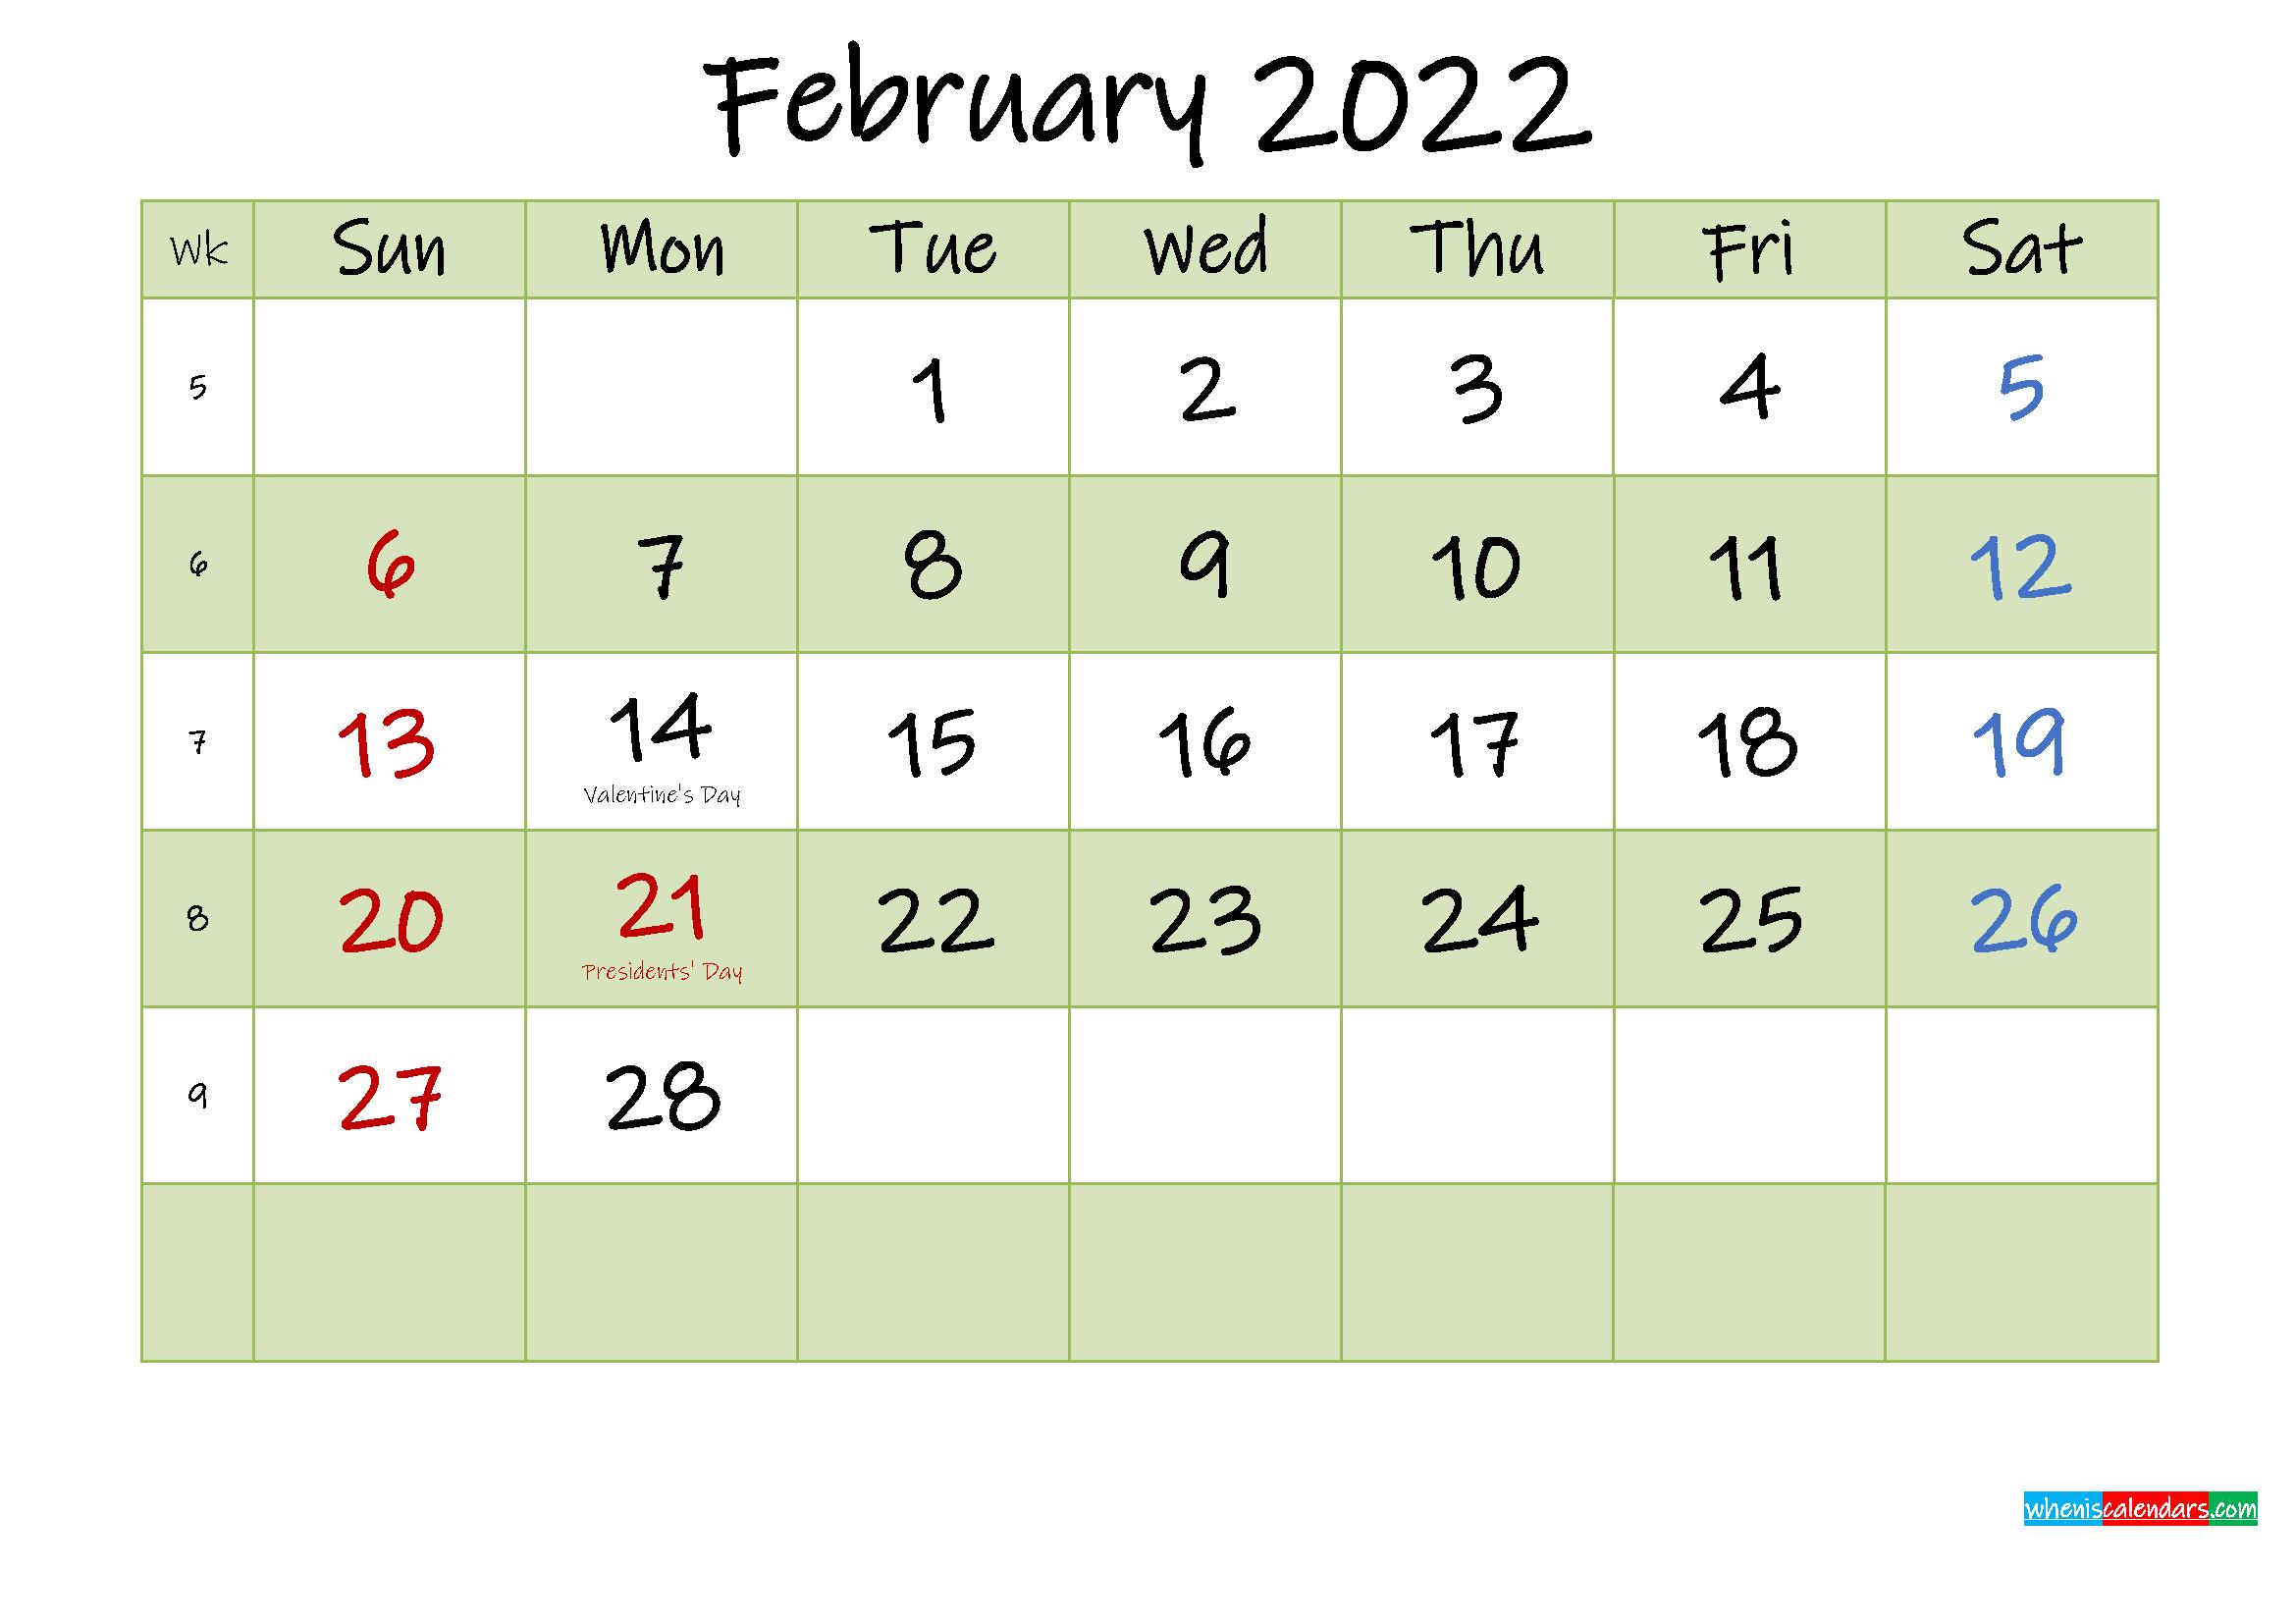 February 2022 Calendar With Holidays Printable - Template Throughout Printable Calendar February 2022